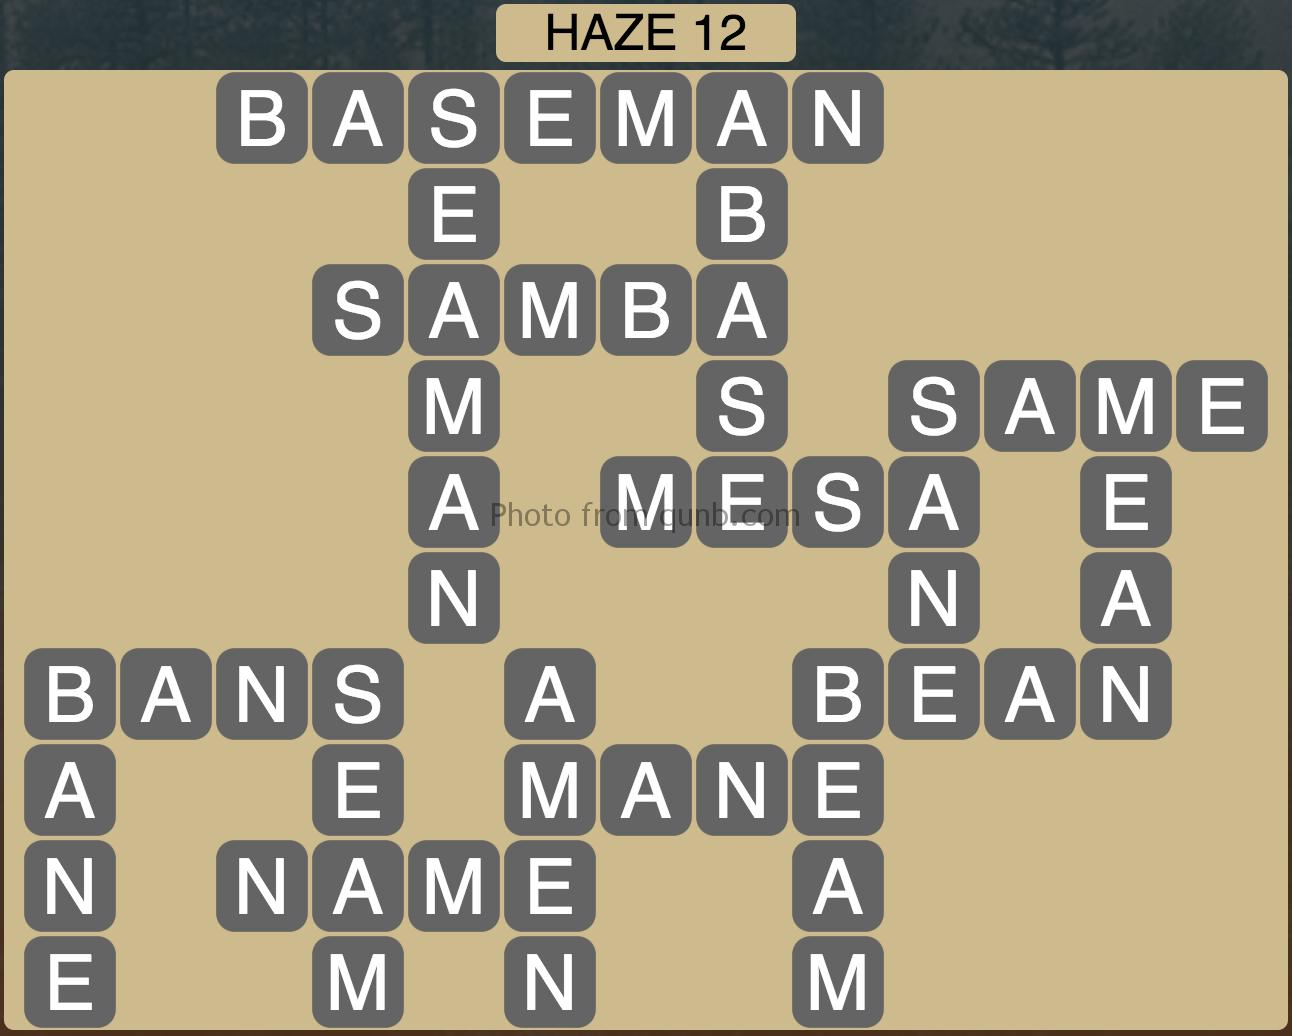 Wordscapes Haze 12 (Level 908) Answers